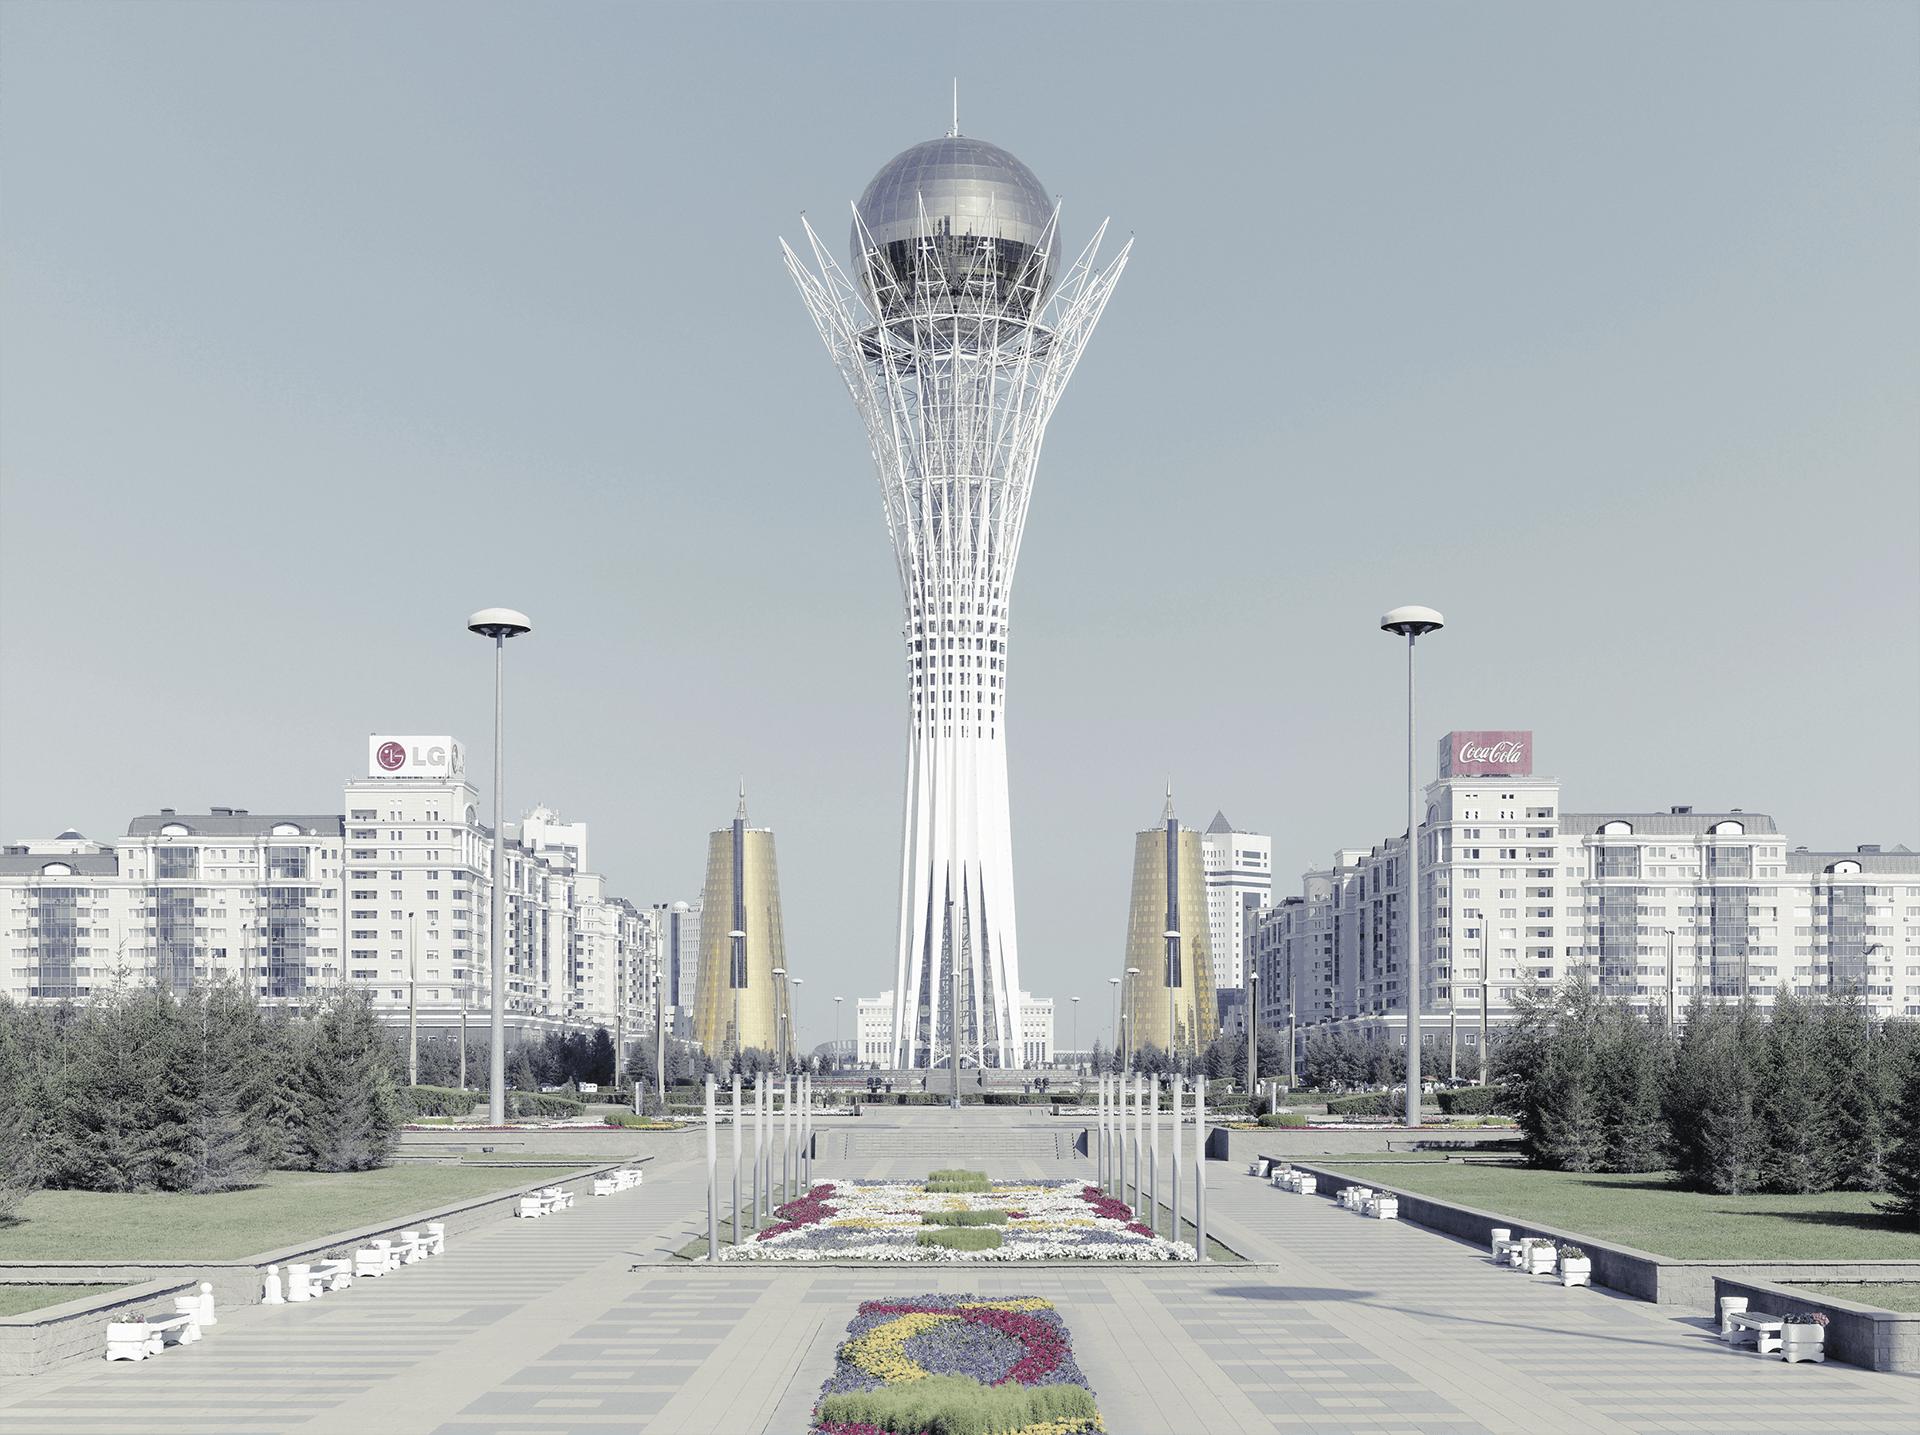 Photo voyage - Fabrice Fouillet - Astana - Bouts du monde